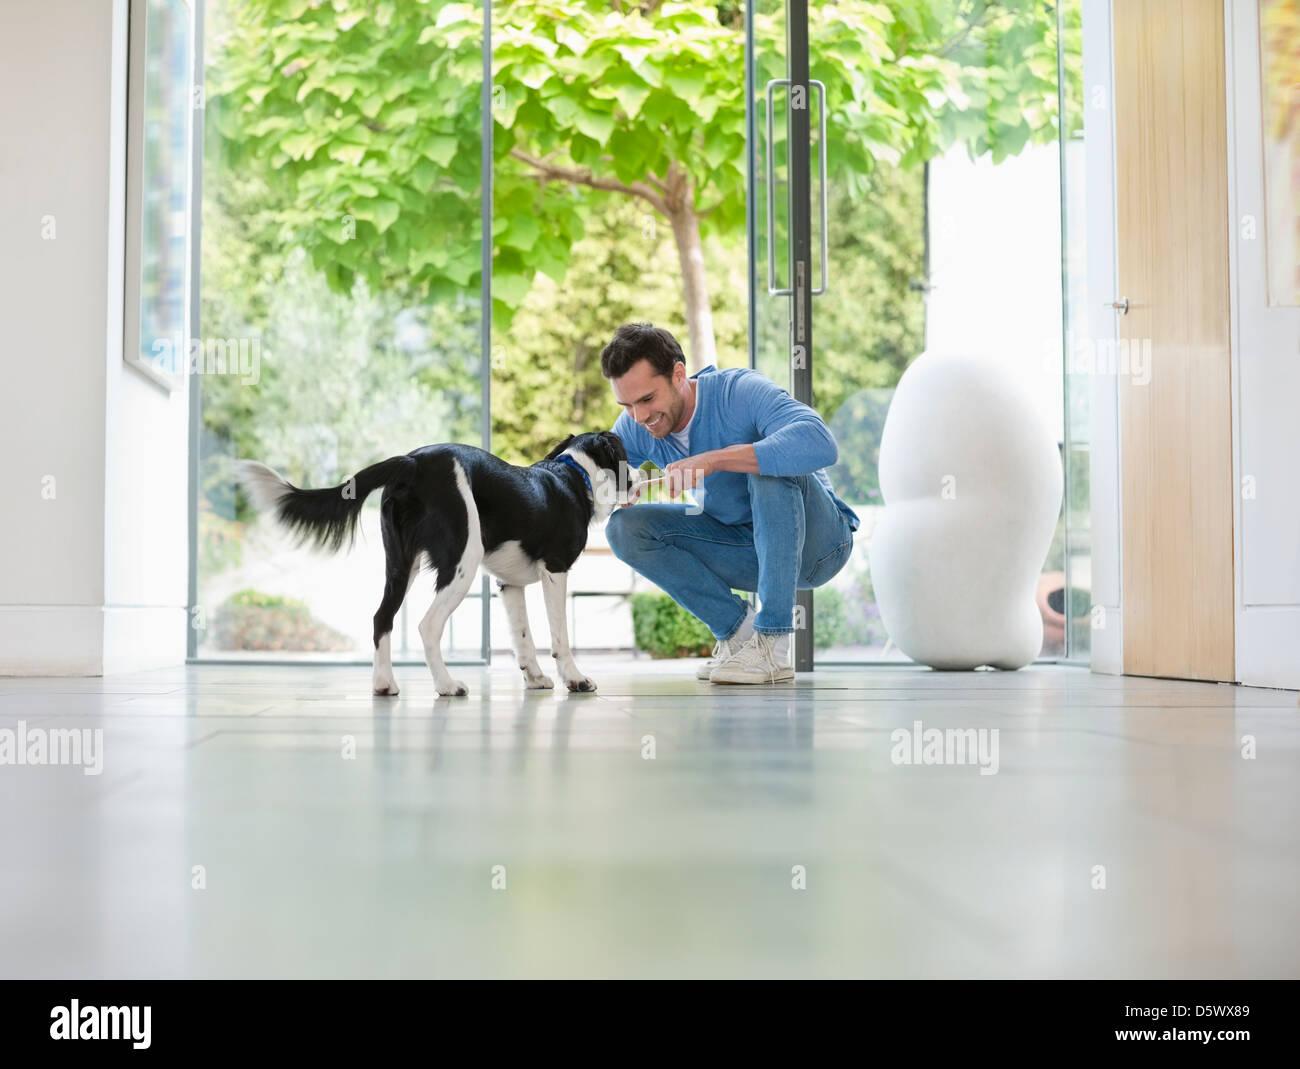 Smiling man petting dog in kitchen - Stock Image